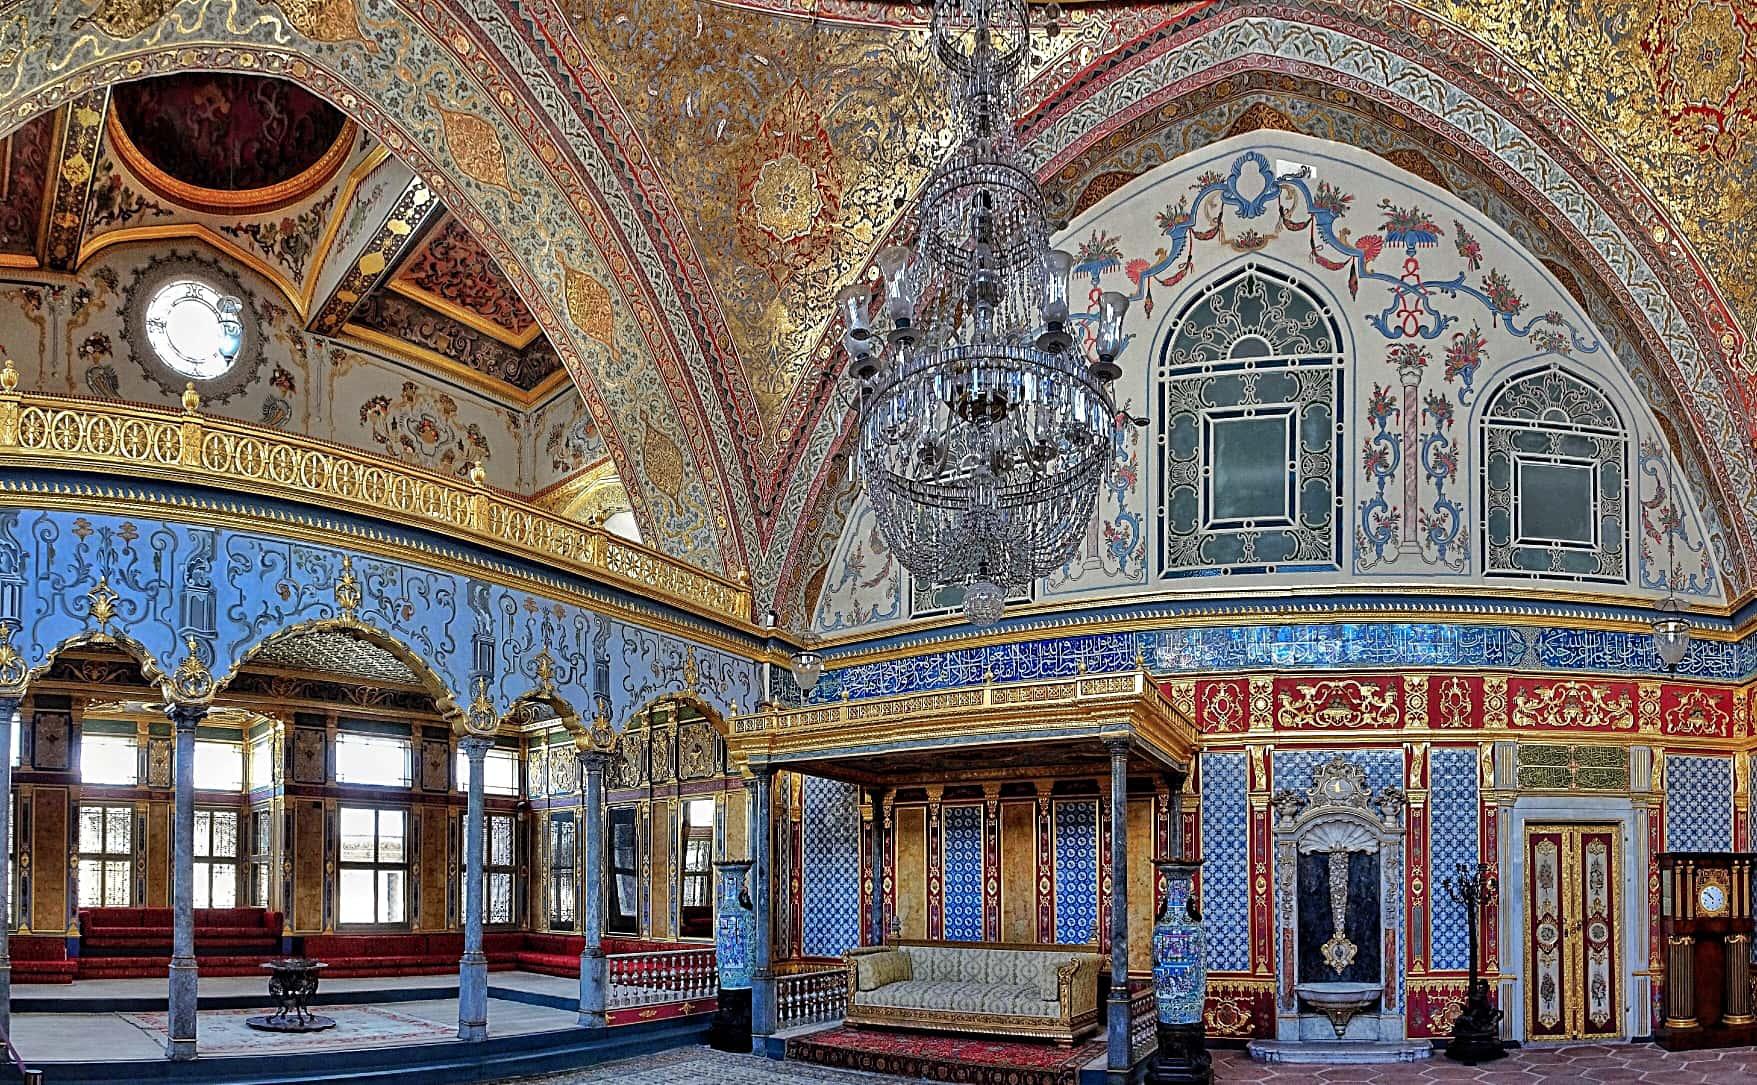 Il harem del palazzo di Topkapi a Istanbul, Turchia